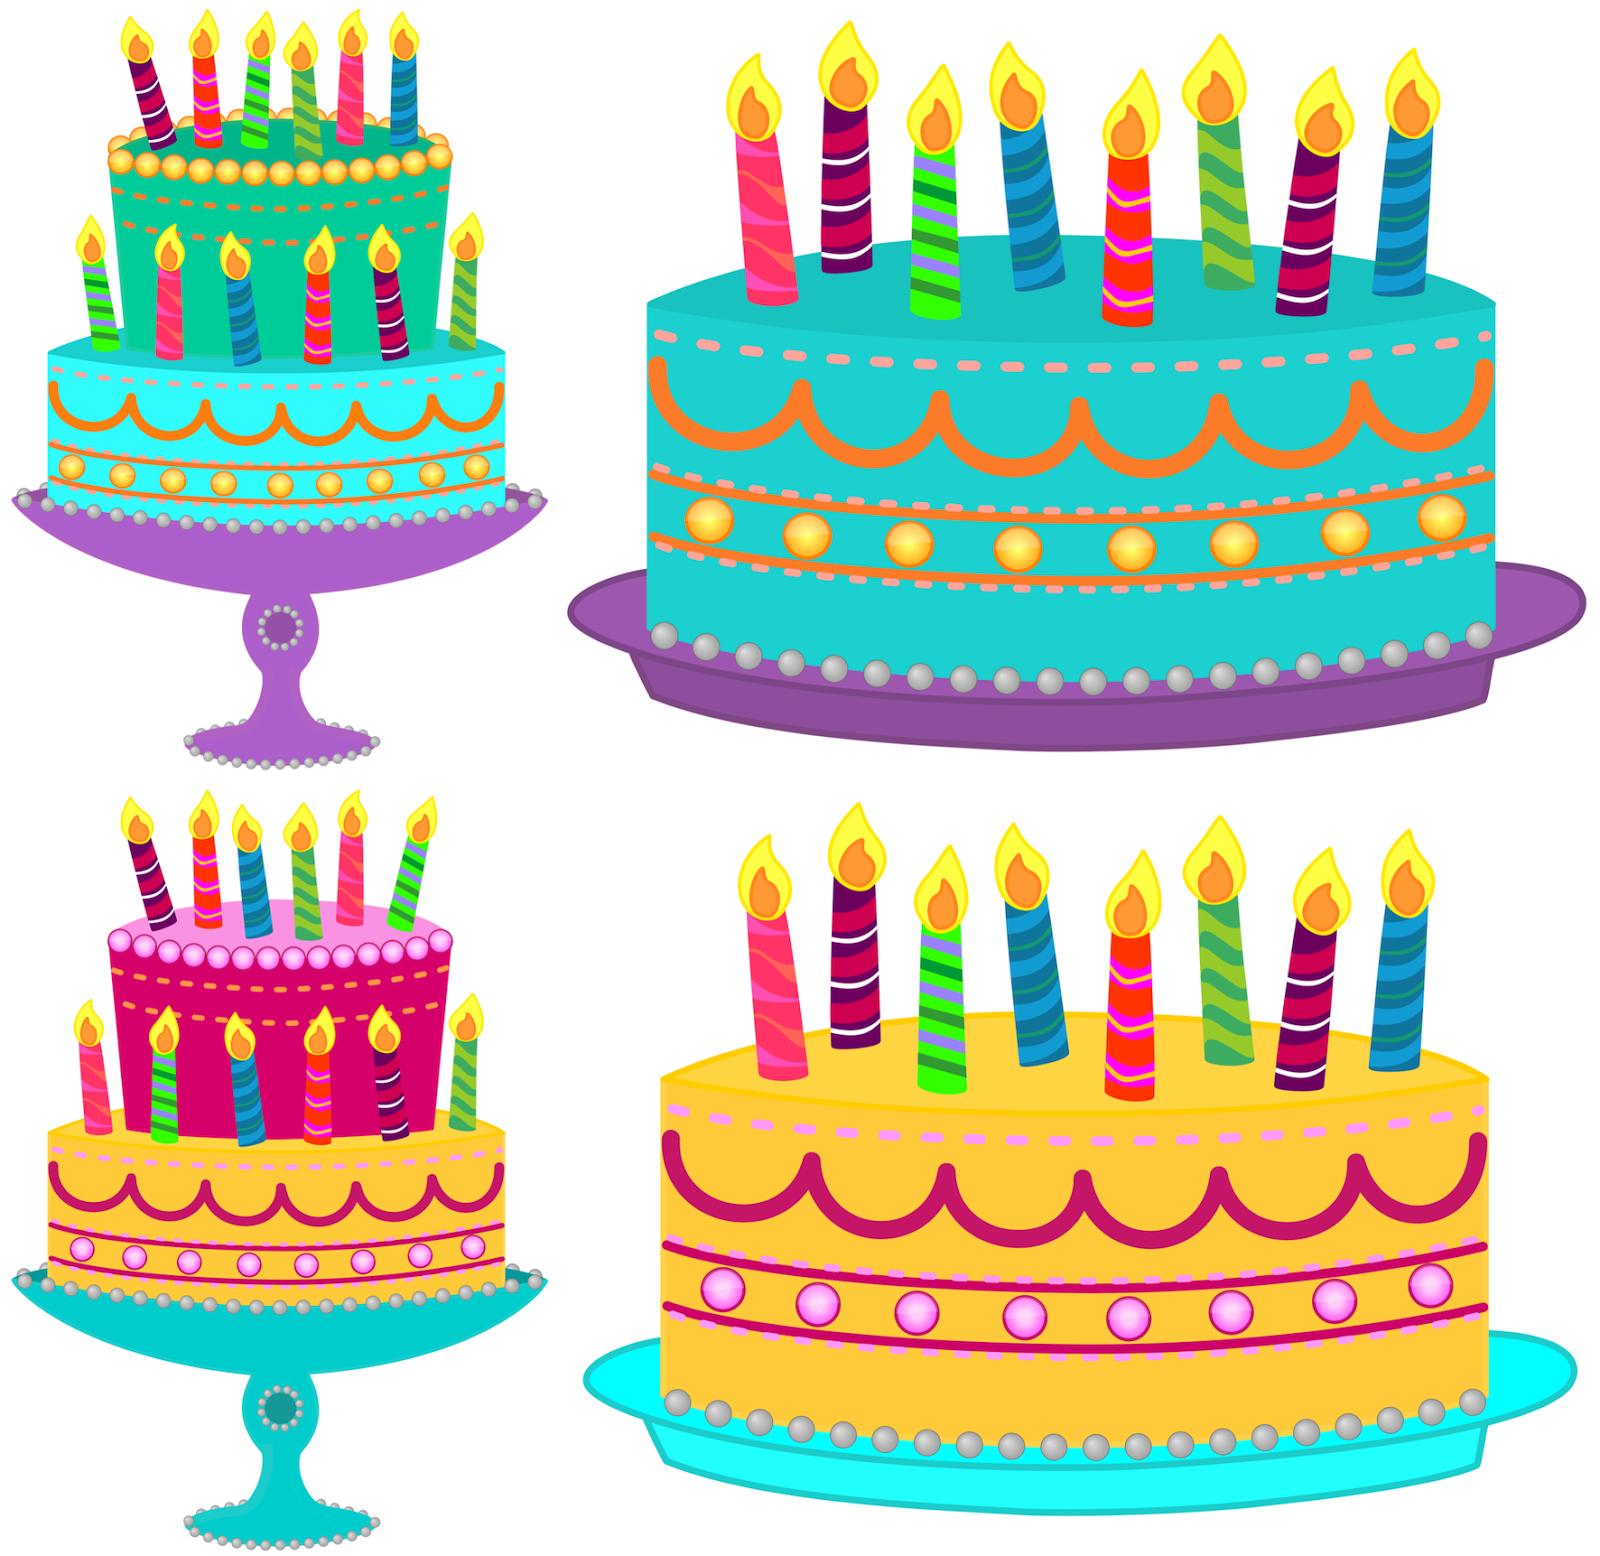 Swell Birthday Cake Clipart Birthday Cake Clip Art Birthday Clips Funny Birthday Cards Online Elaedamsfinfo